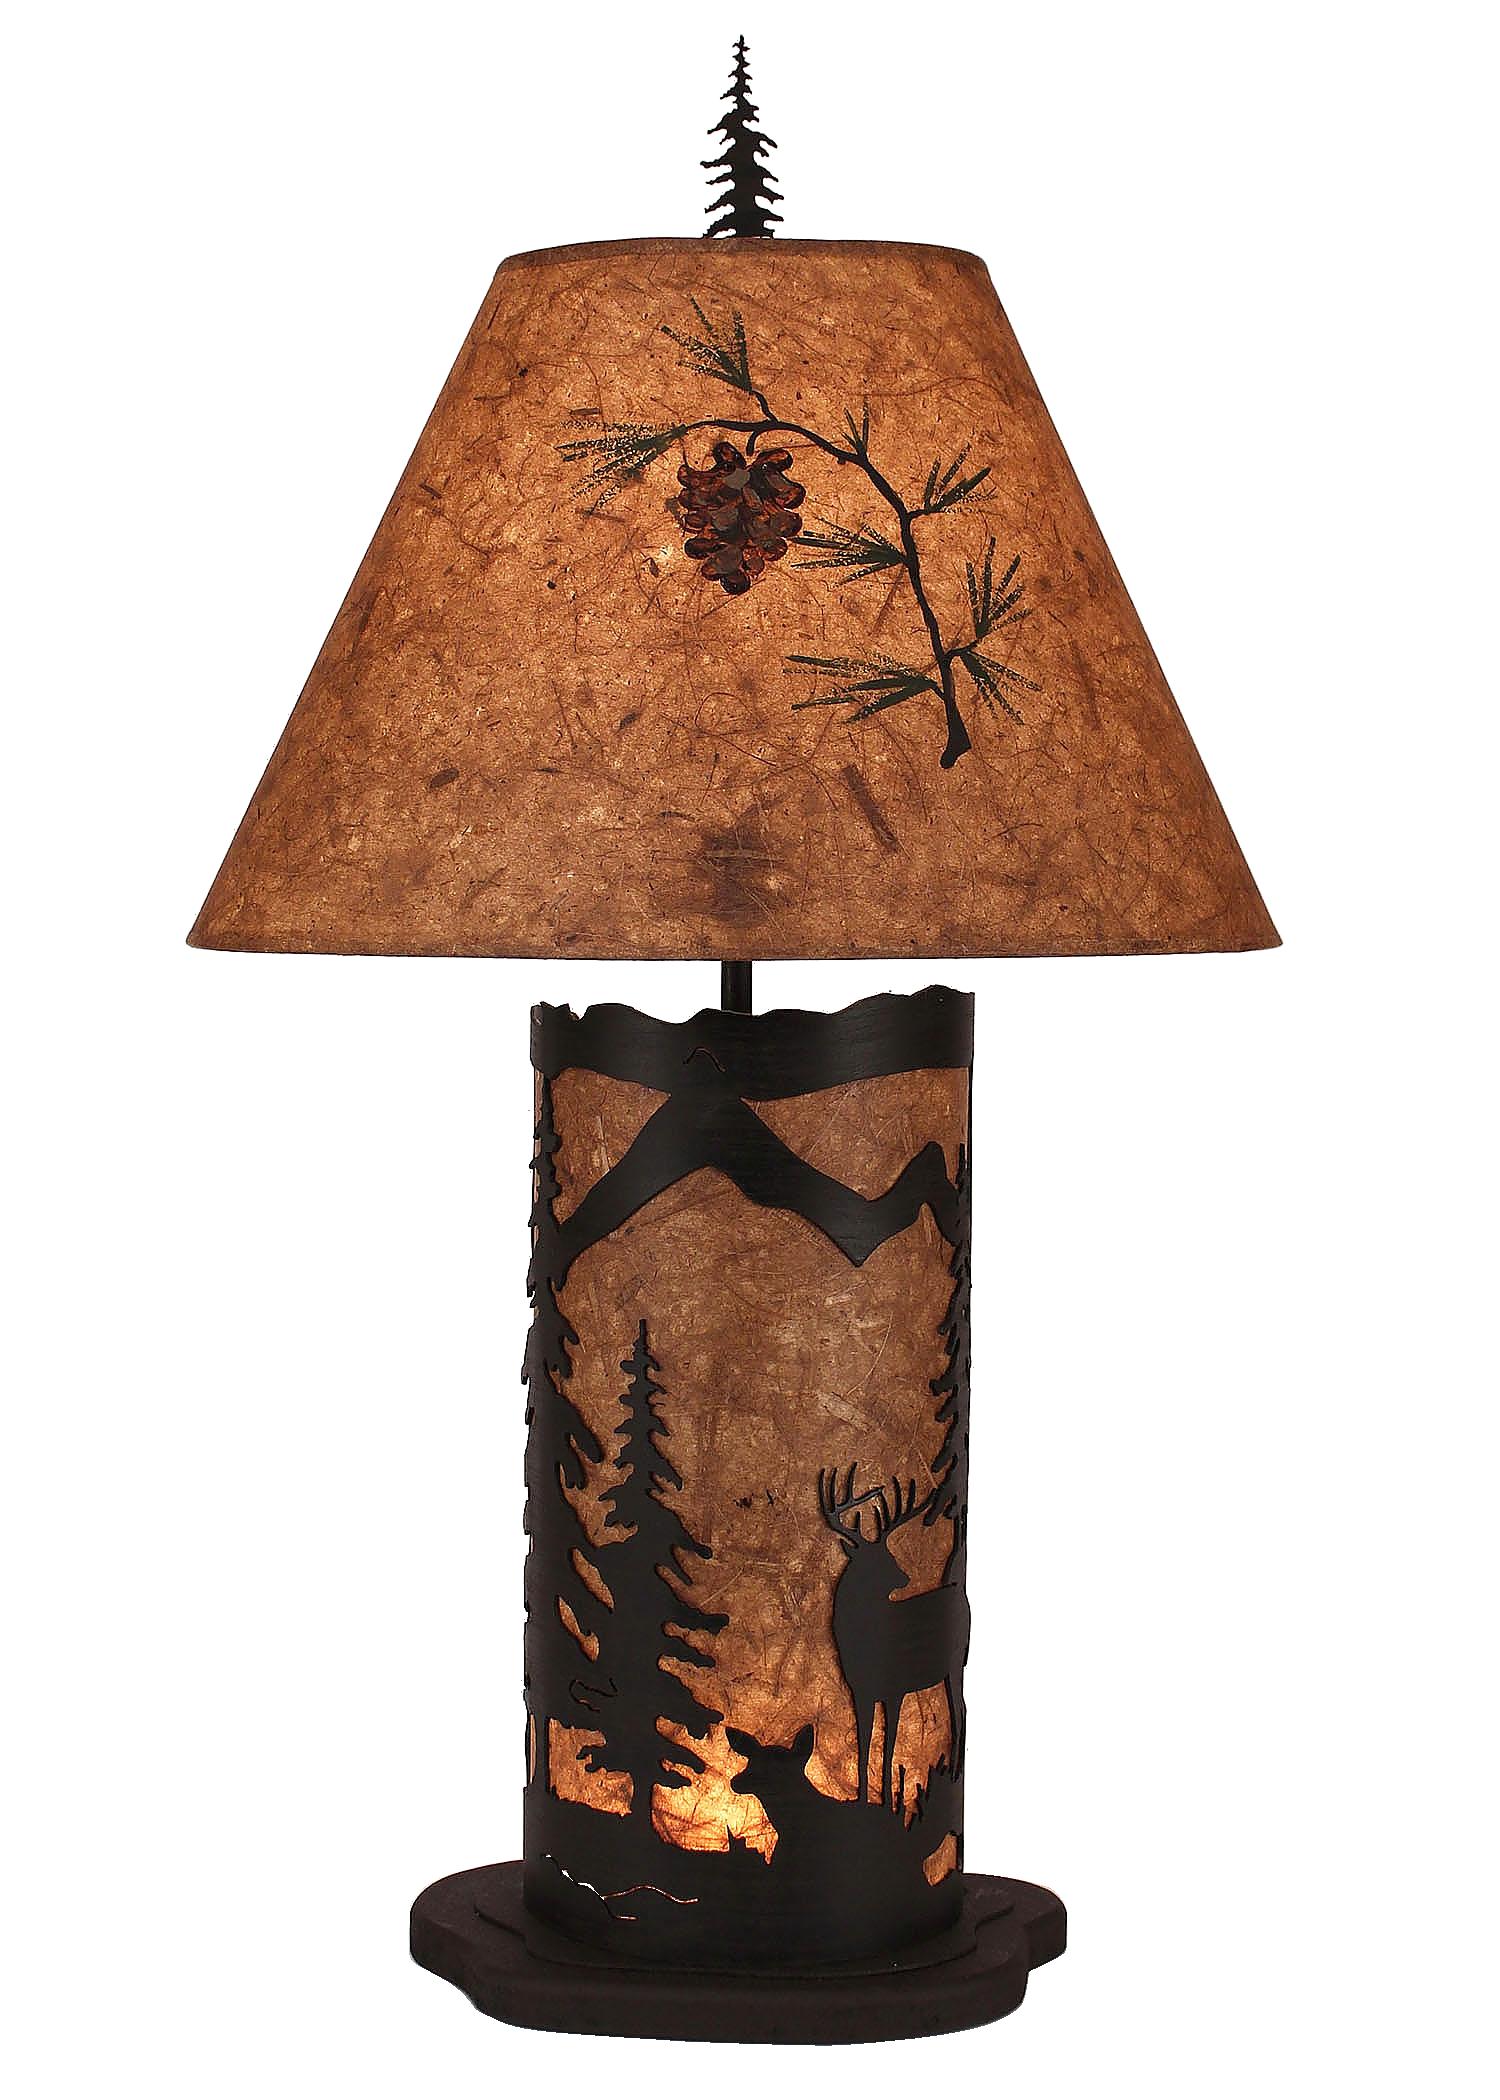 beauty small kodiak. Lamp clipart bedroom lamp